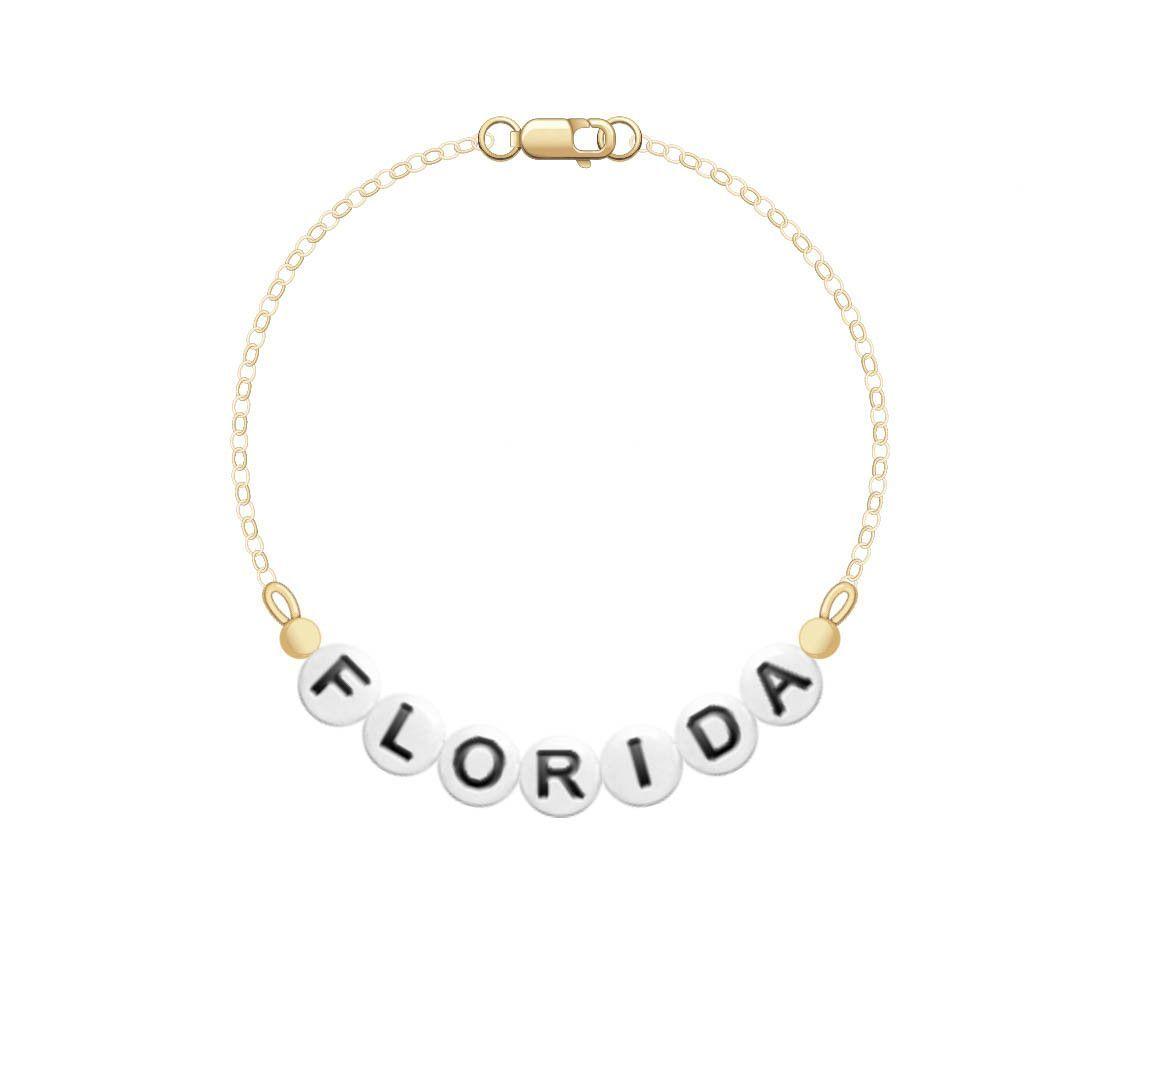 Florida bracelet